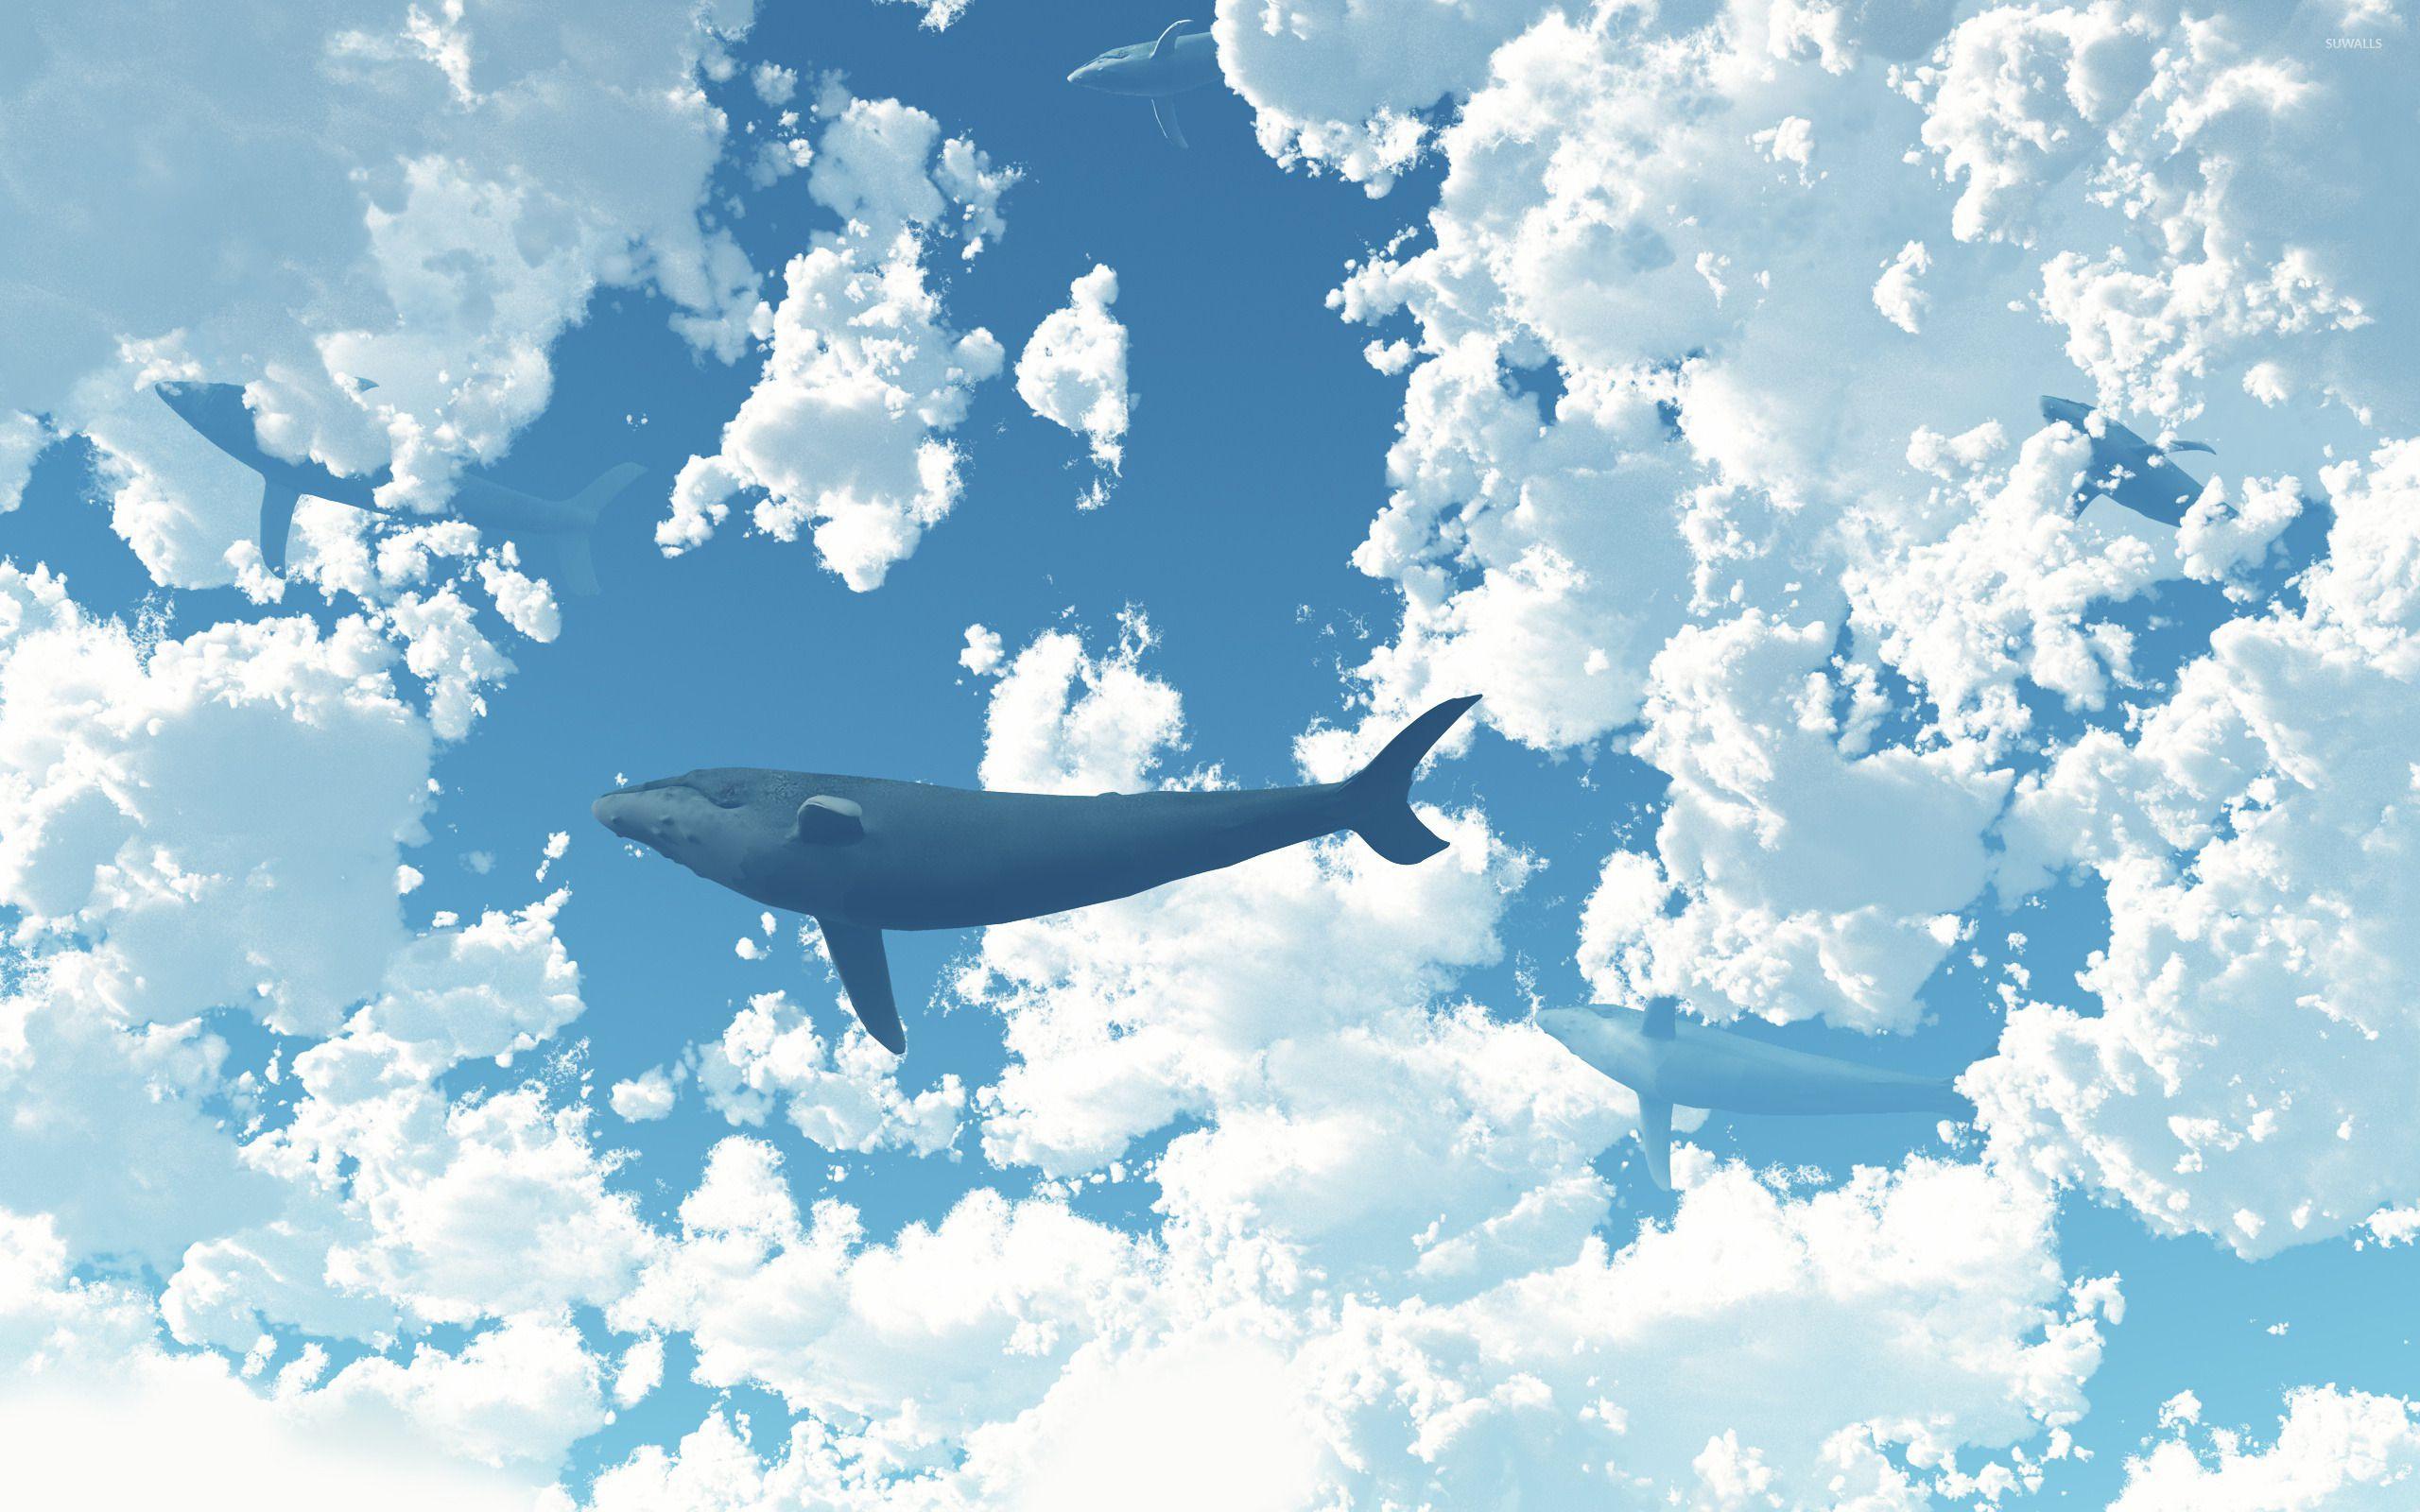 Whale in the sky 2 wallpaper - Artistic wallpapers - #20809 | 컴퓨터 배경화면, 배경화면, Pc 배경화면